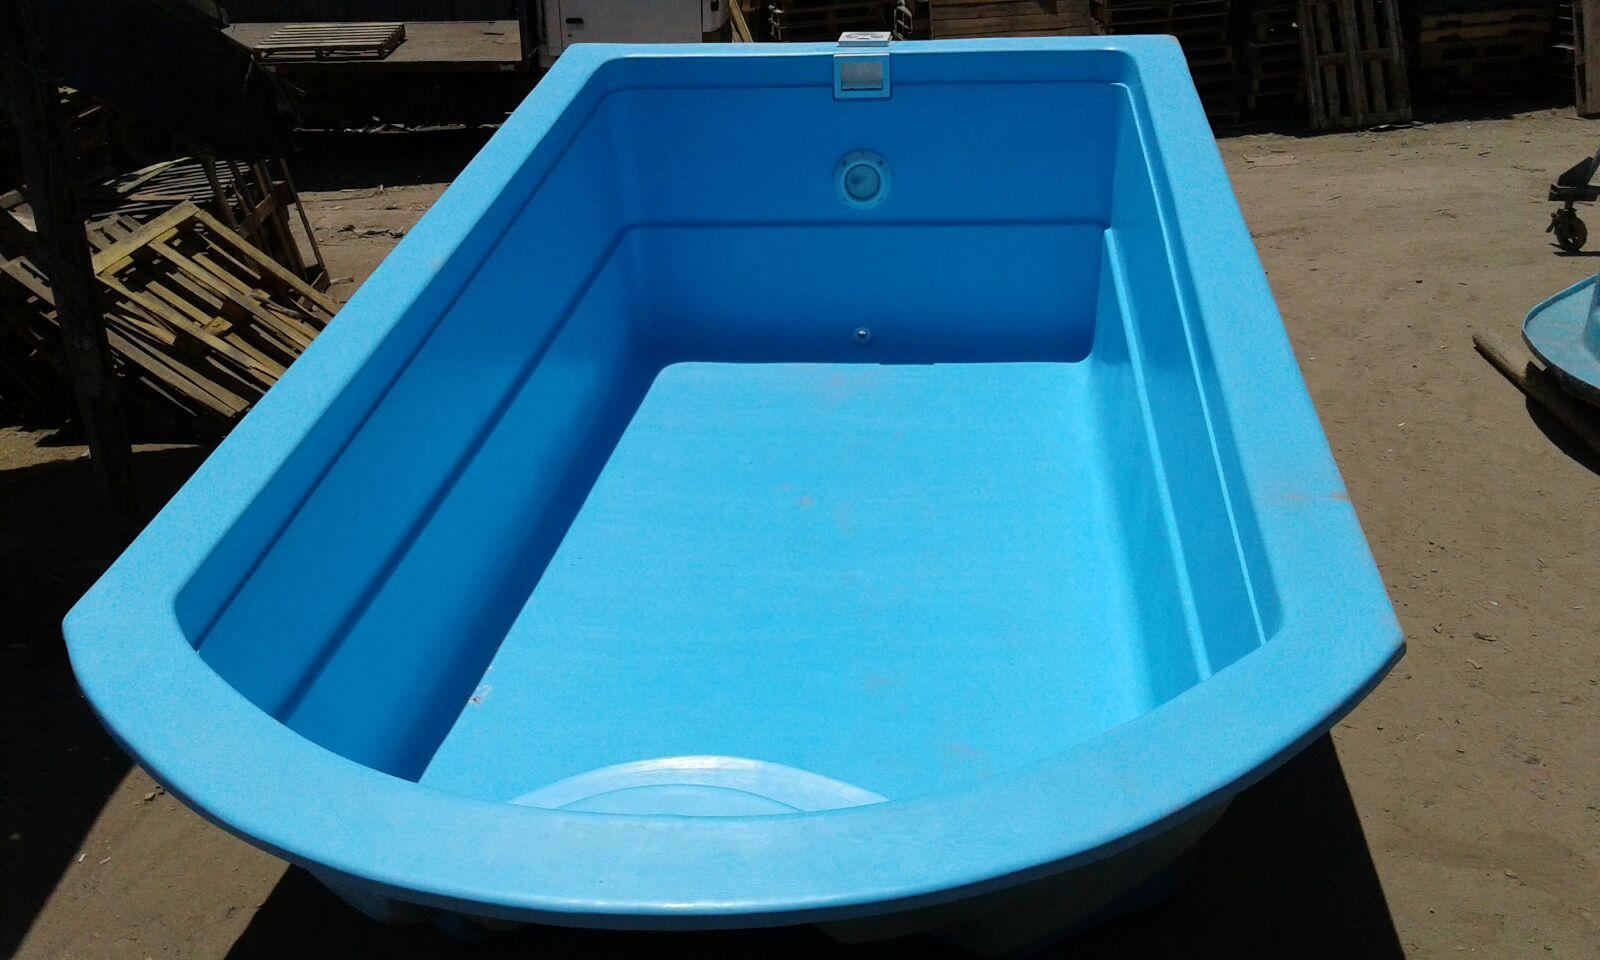 Piscina de fibra de vidrio modelo rectangular 6 3 for Costo piscina fibra de vidrio